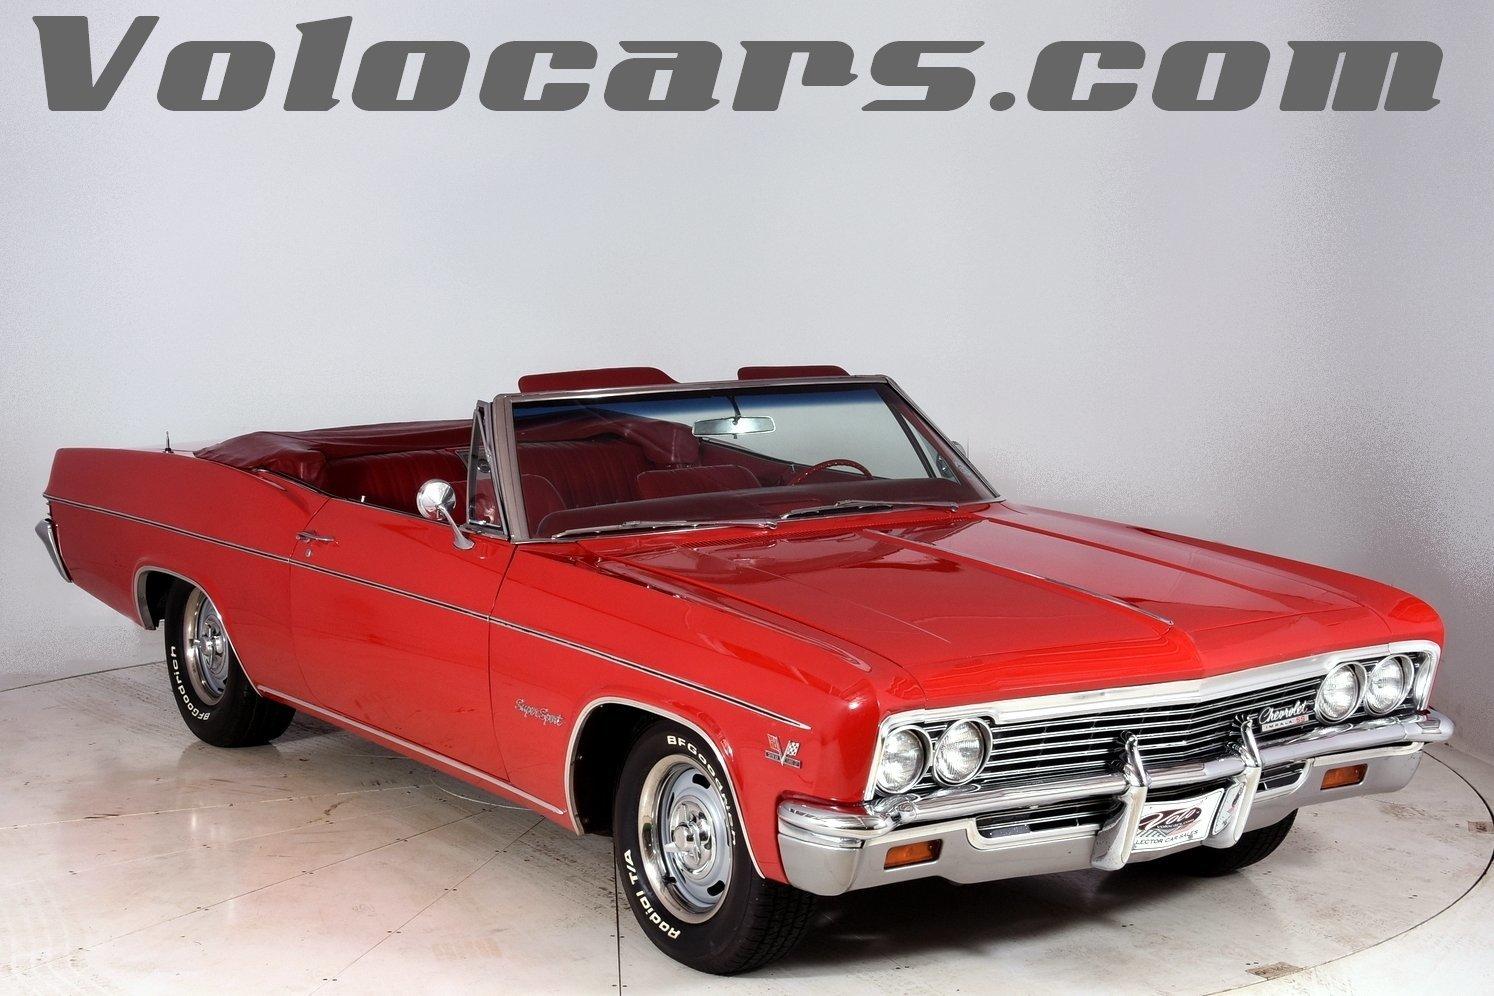 1966 Chevrolet Impala Volo Auto Museum Chevy Frame